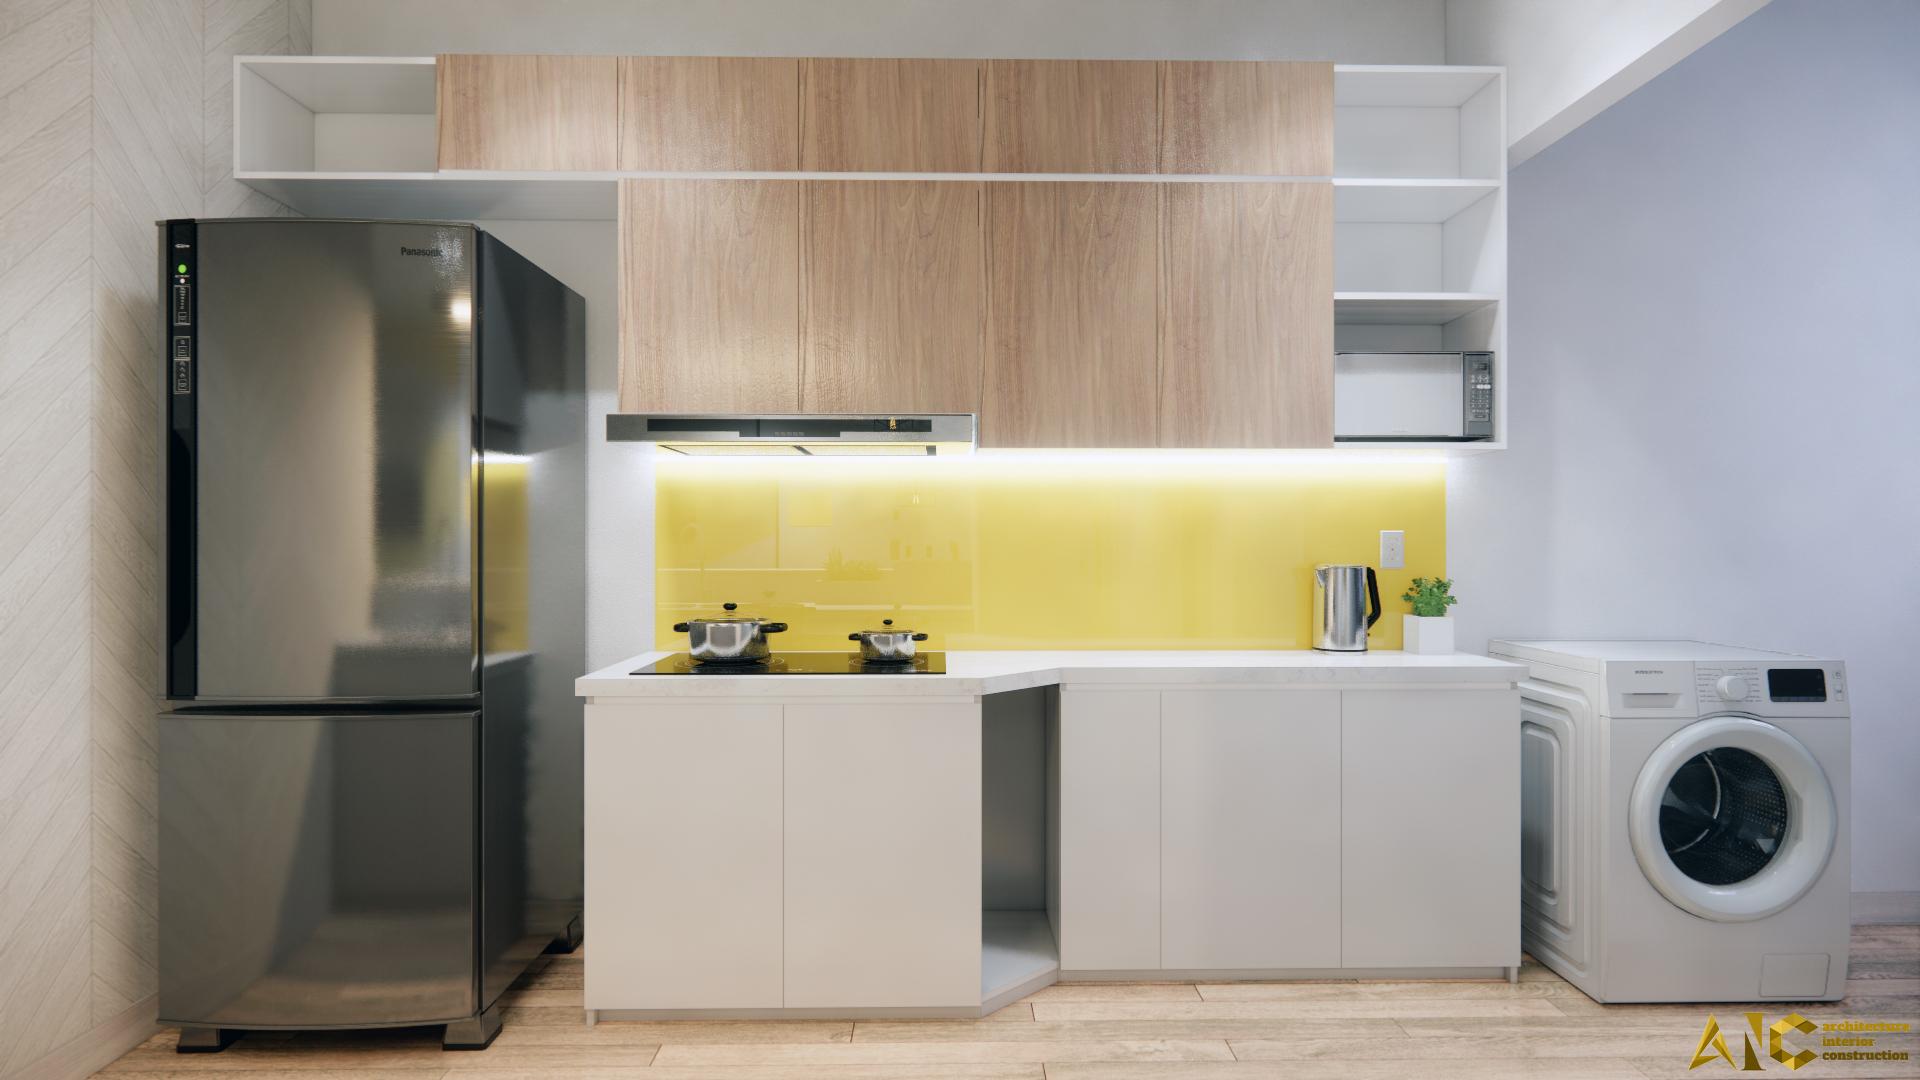 thiết kế căn hộ him lam (7)